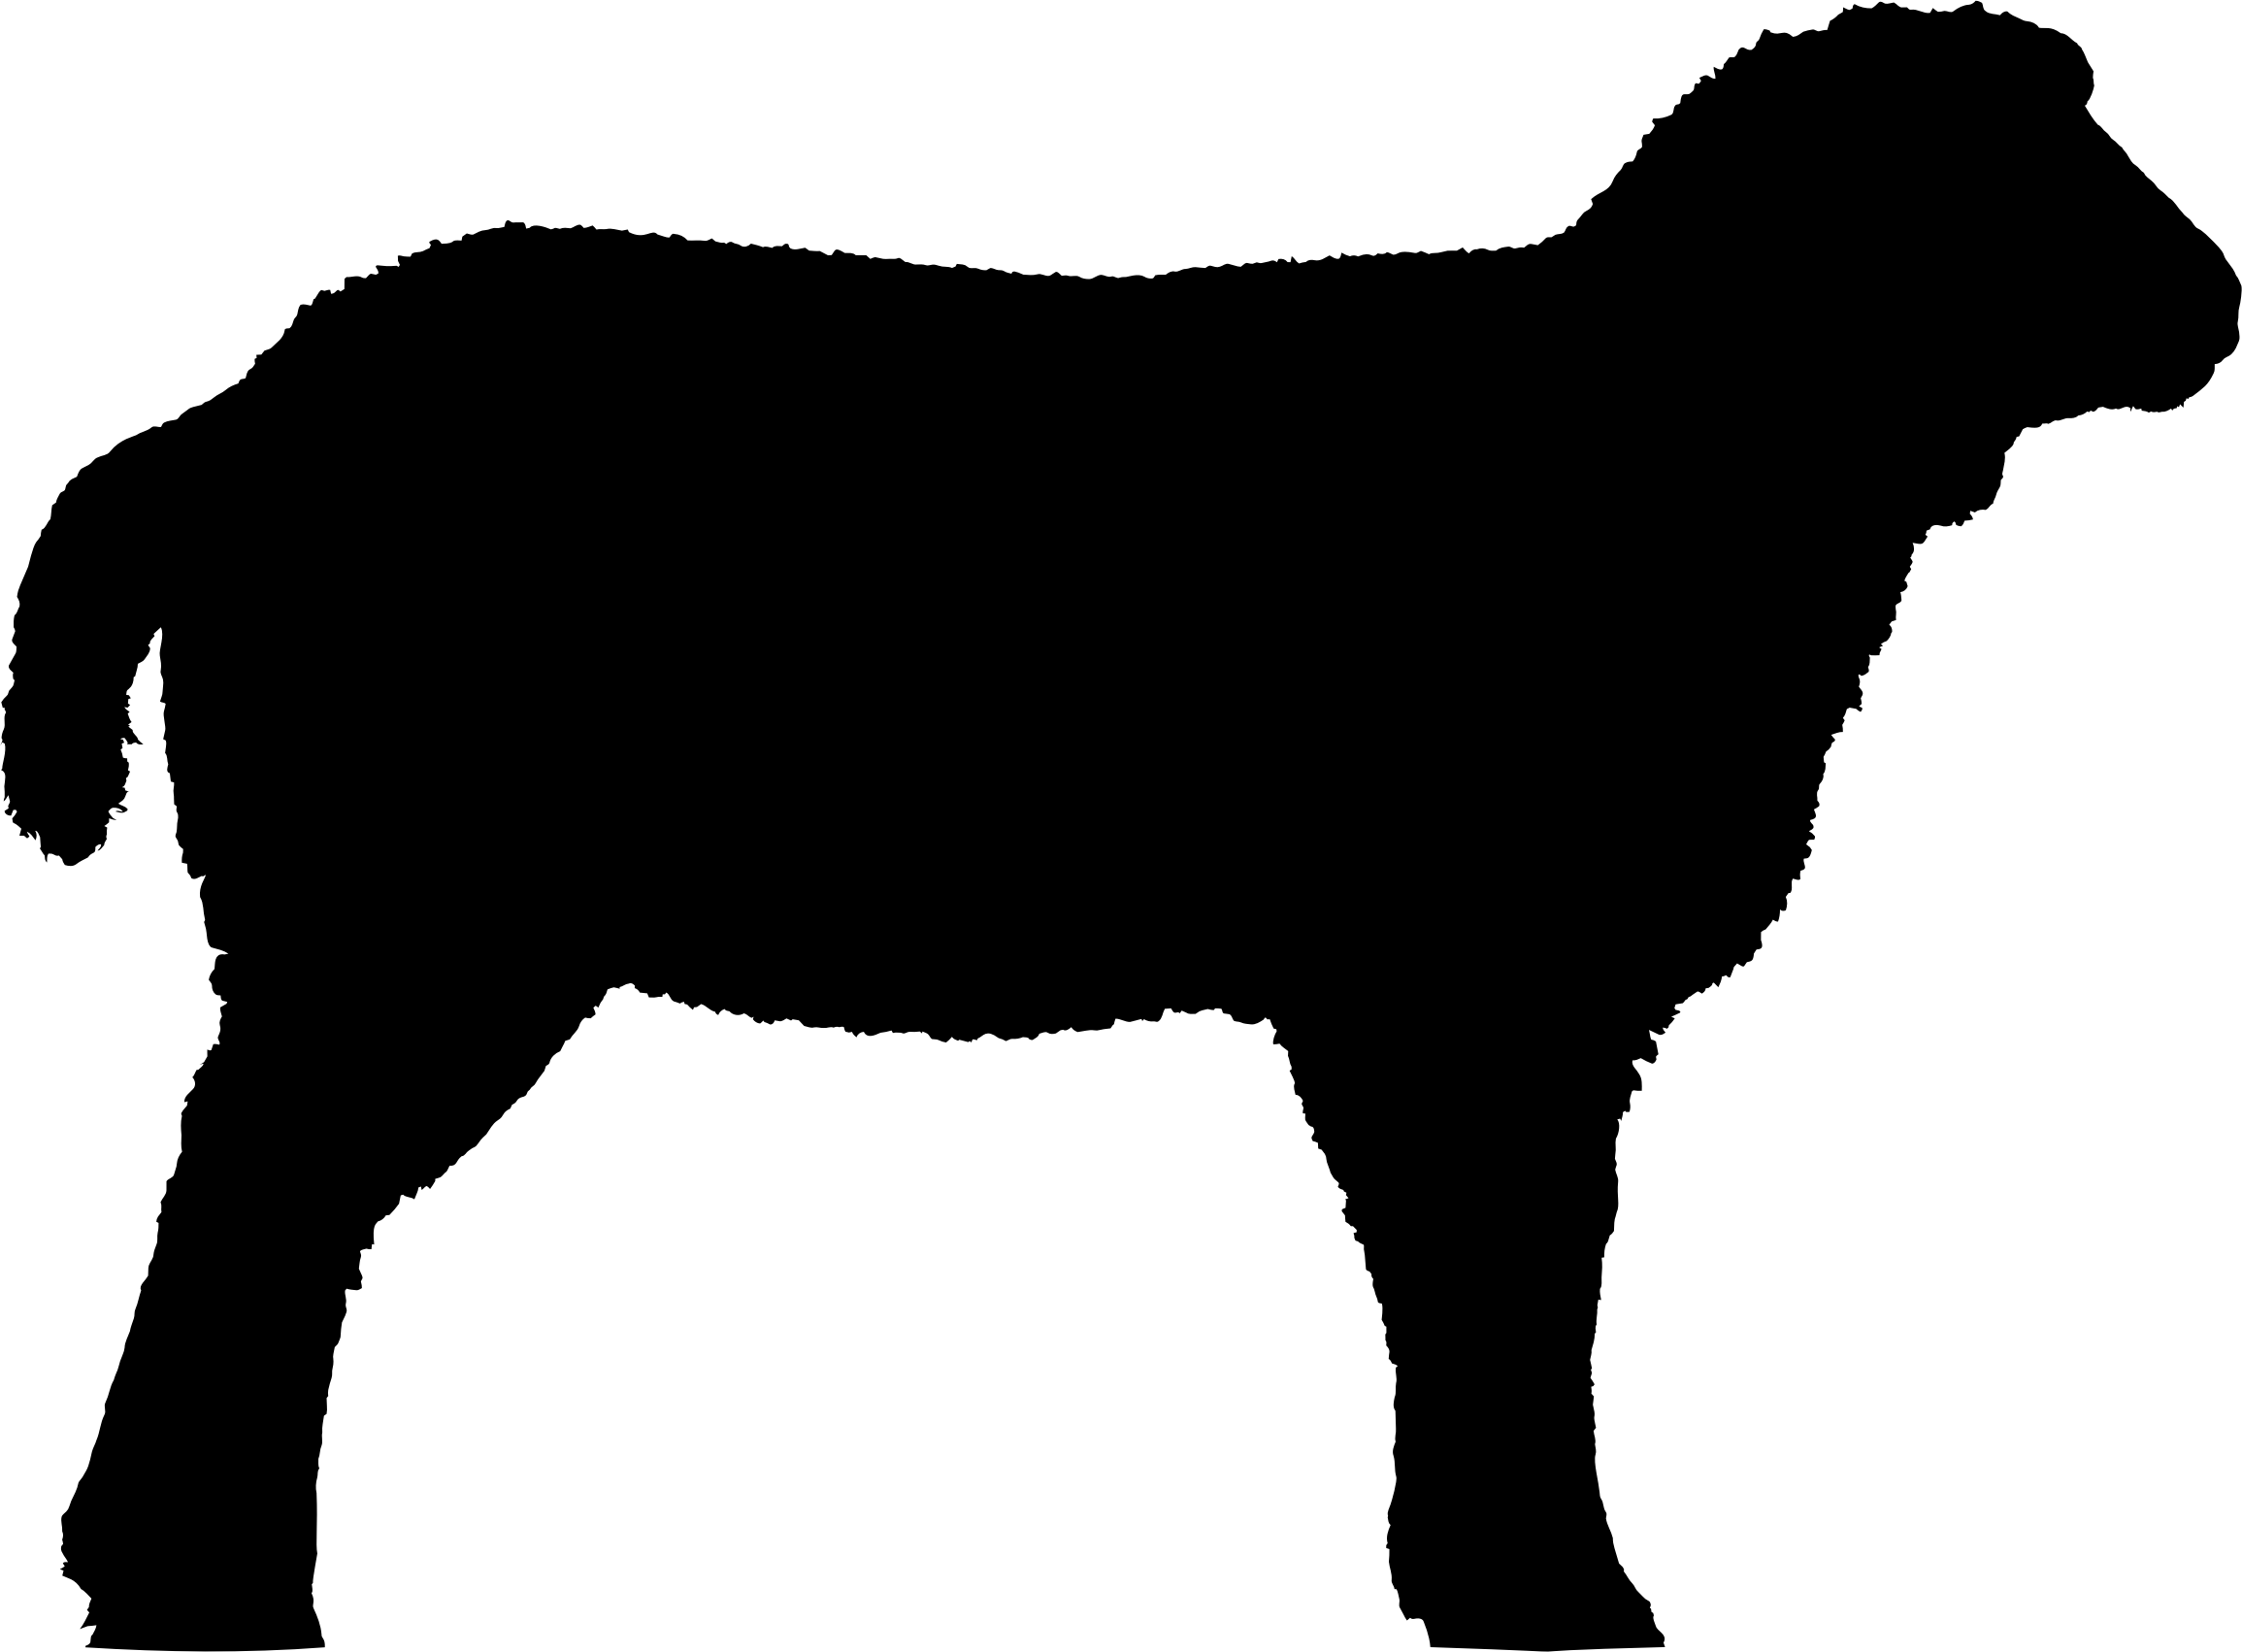 2310x1702 Lamb Clipart Silhouette